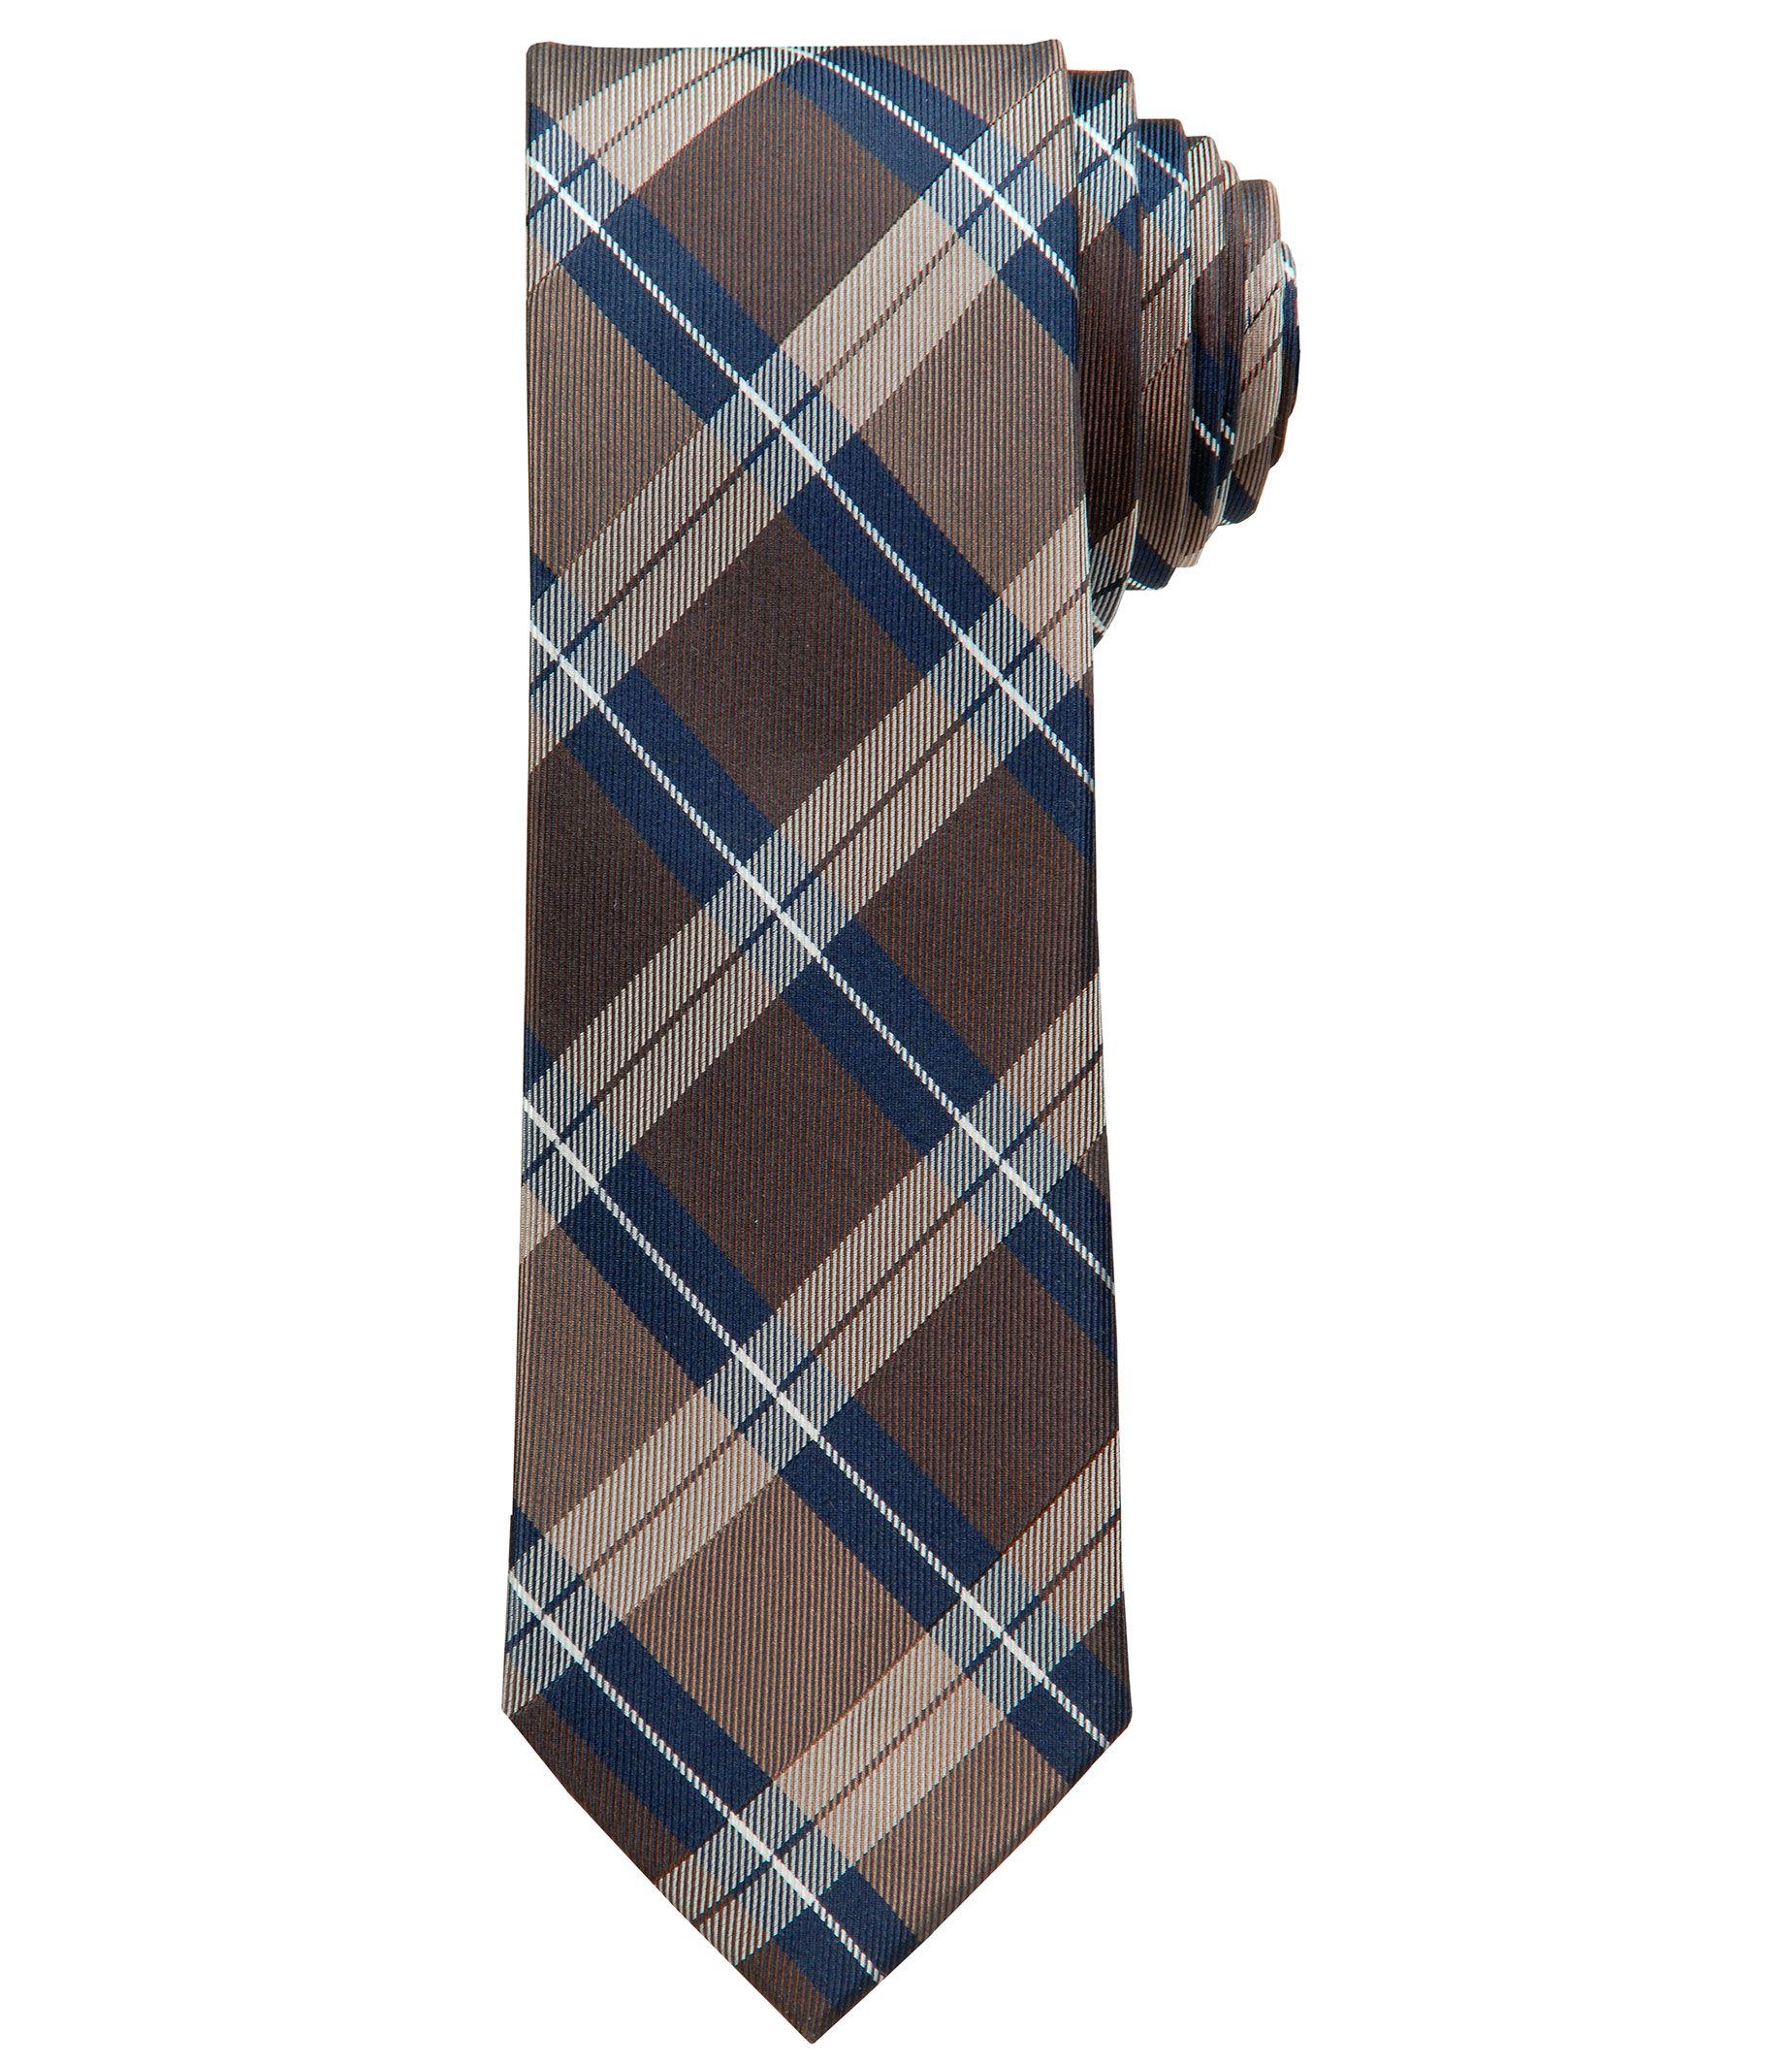 Joseph Slim Plaid Tie